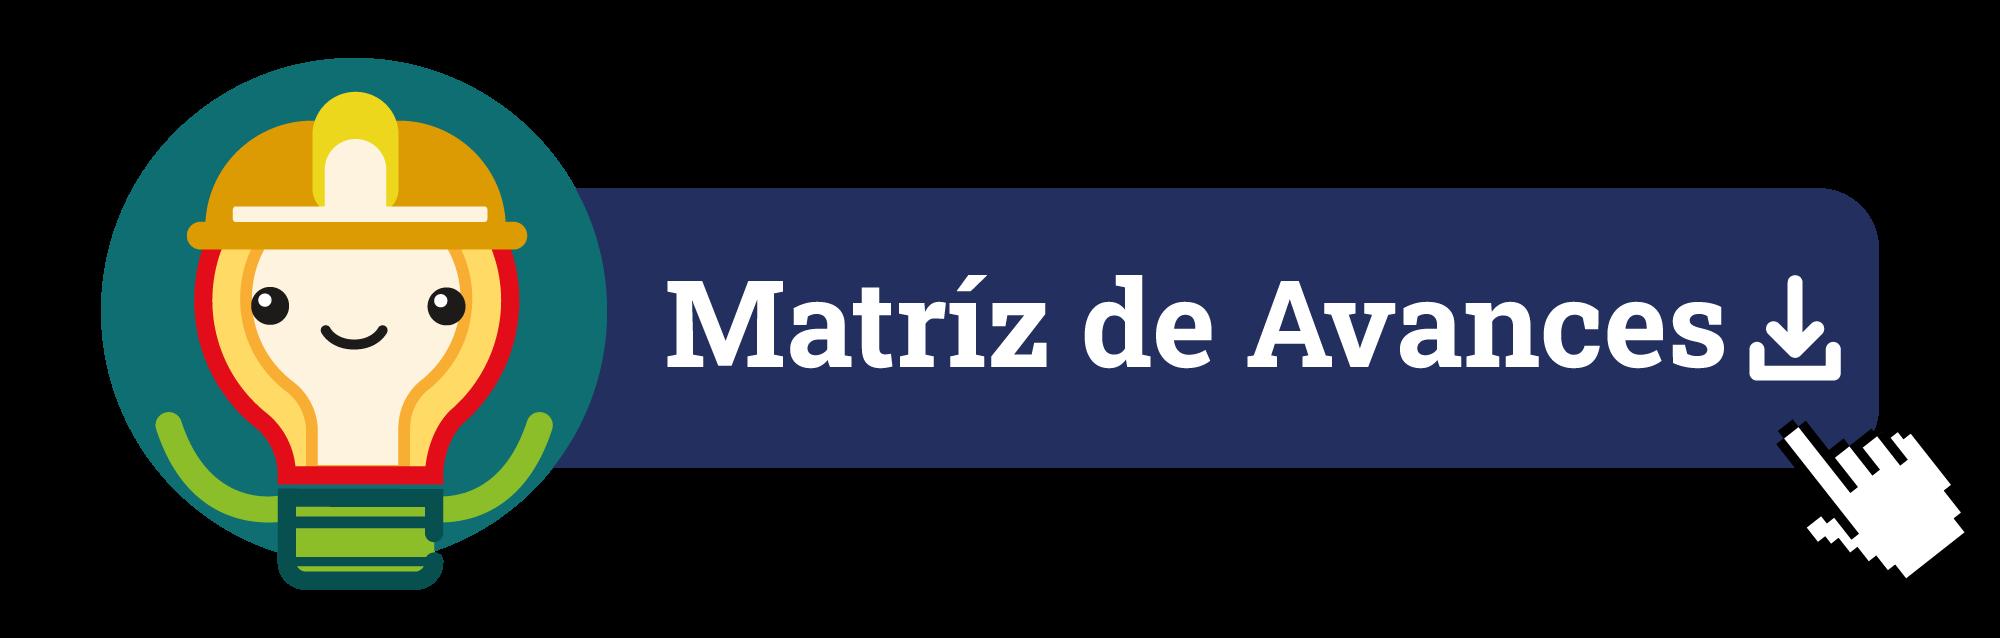 matriz-avances